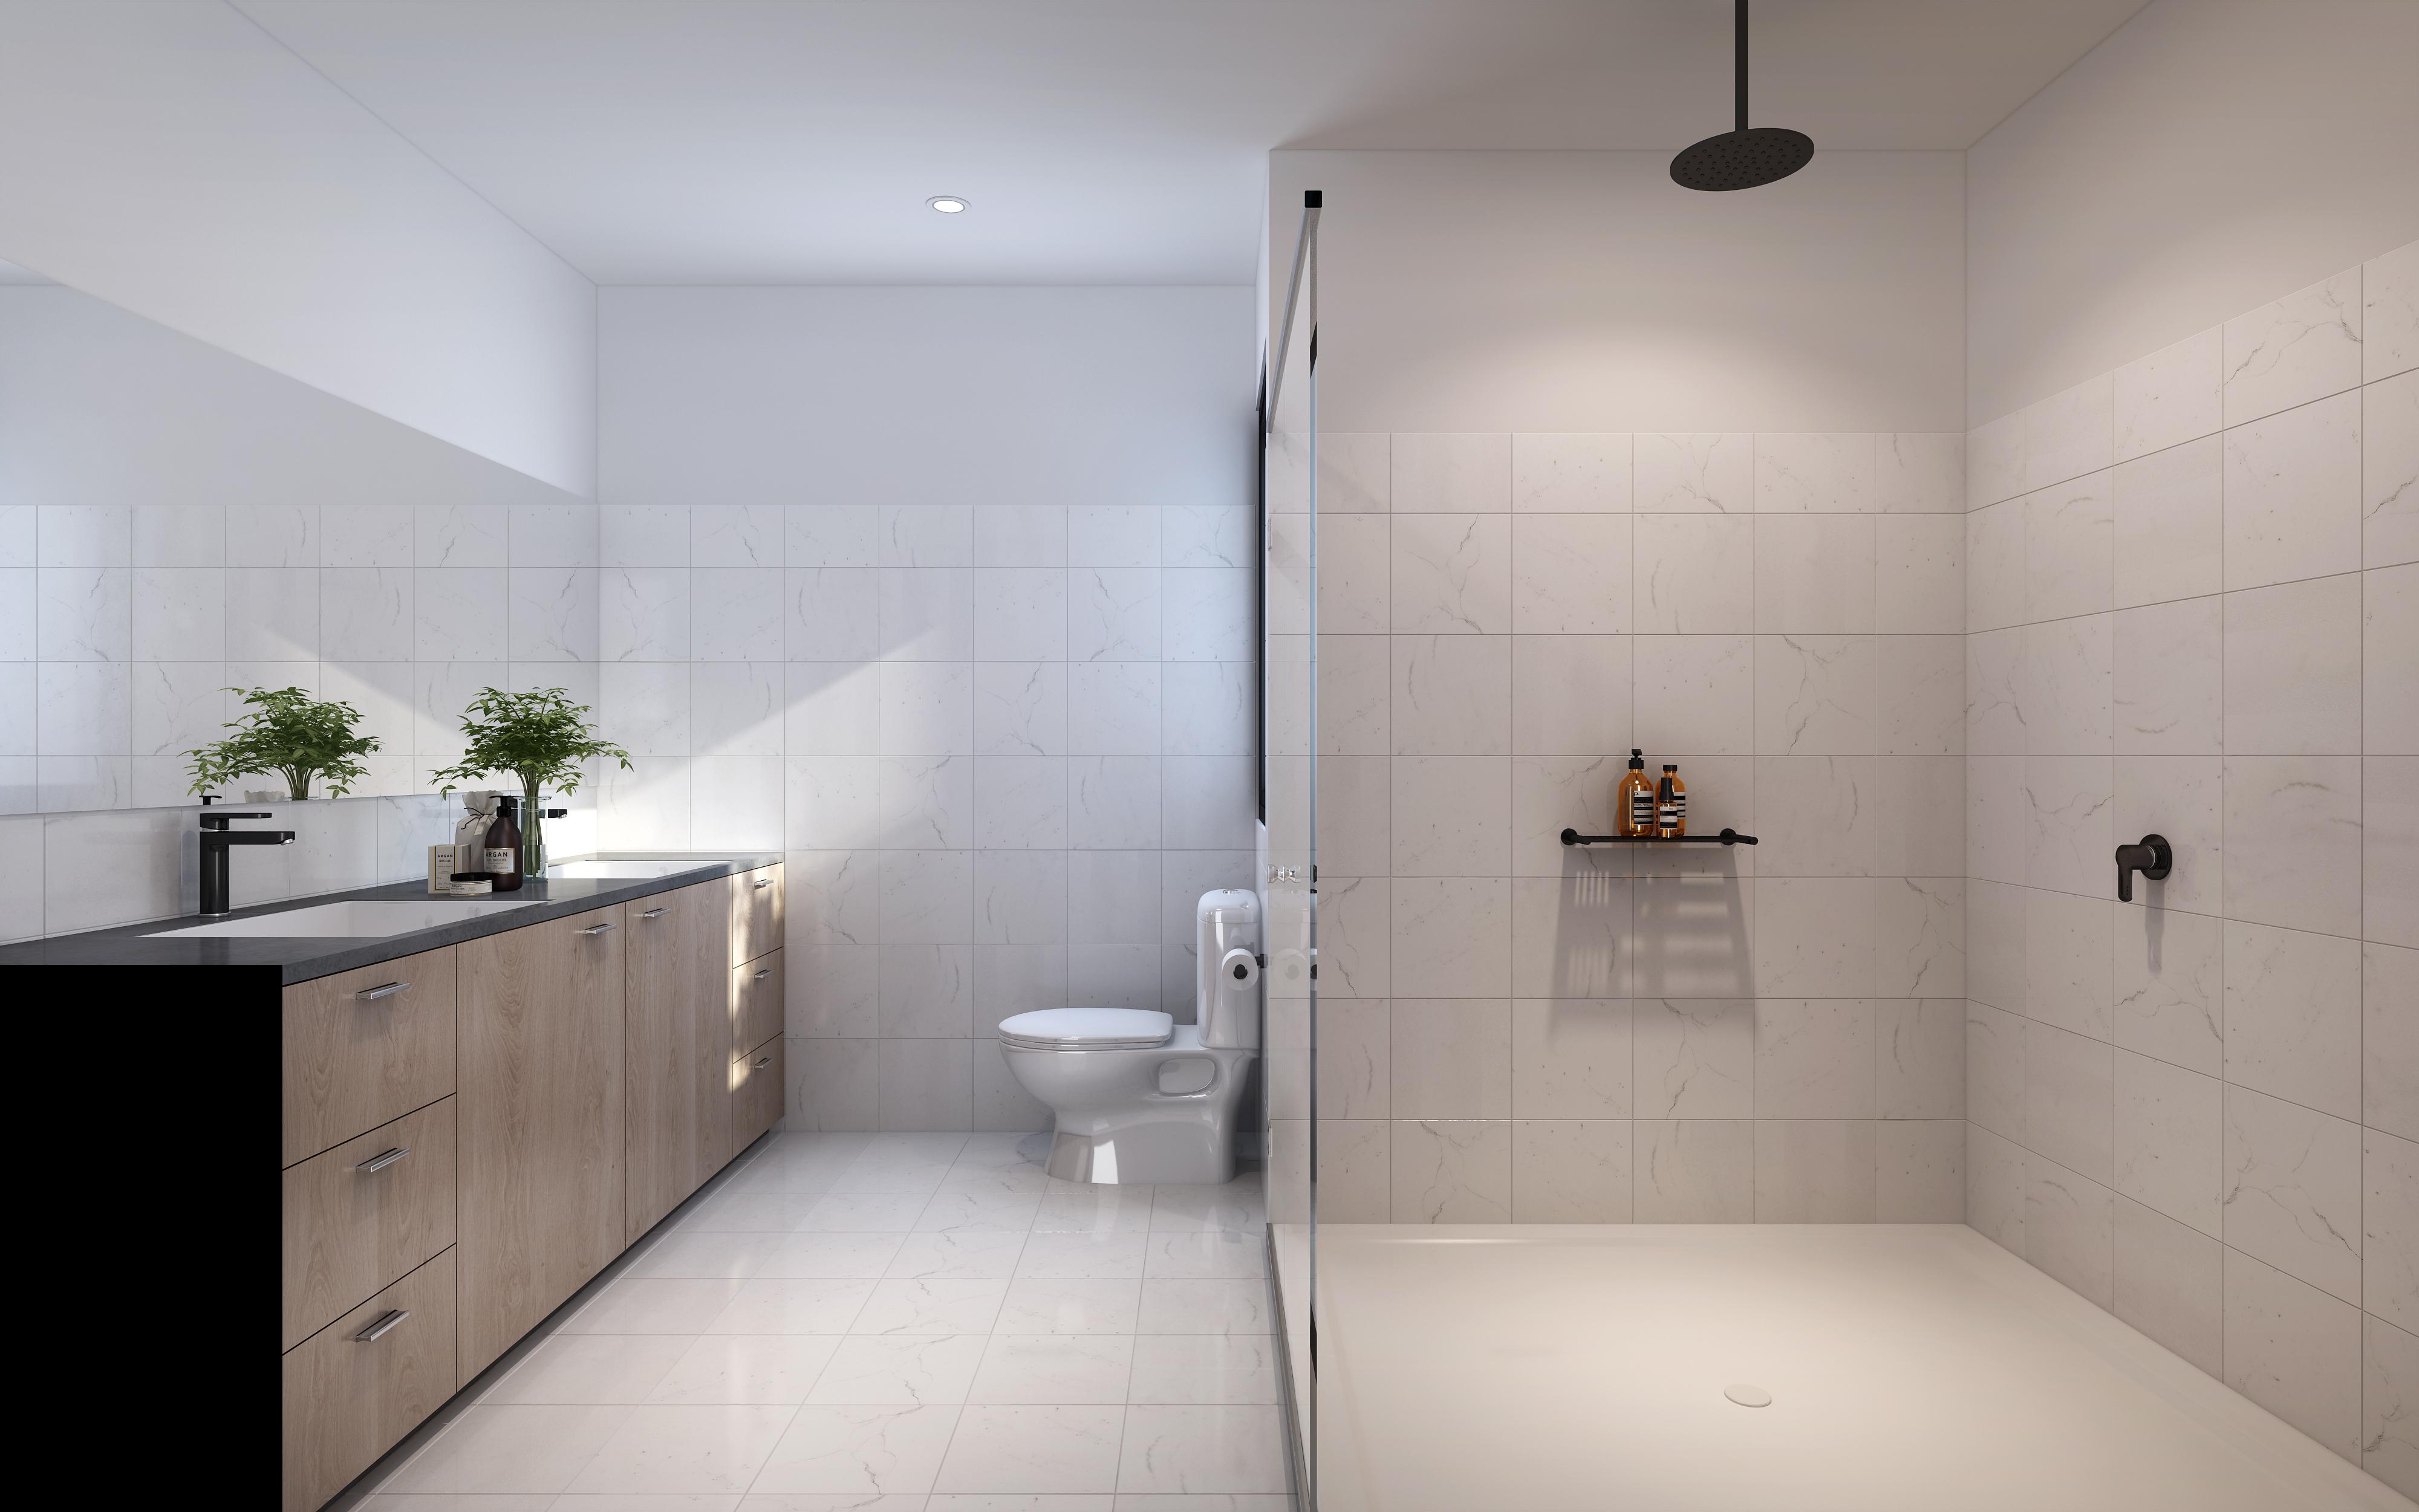 Standard Townhouse Bathroom Area